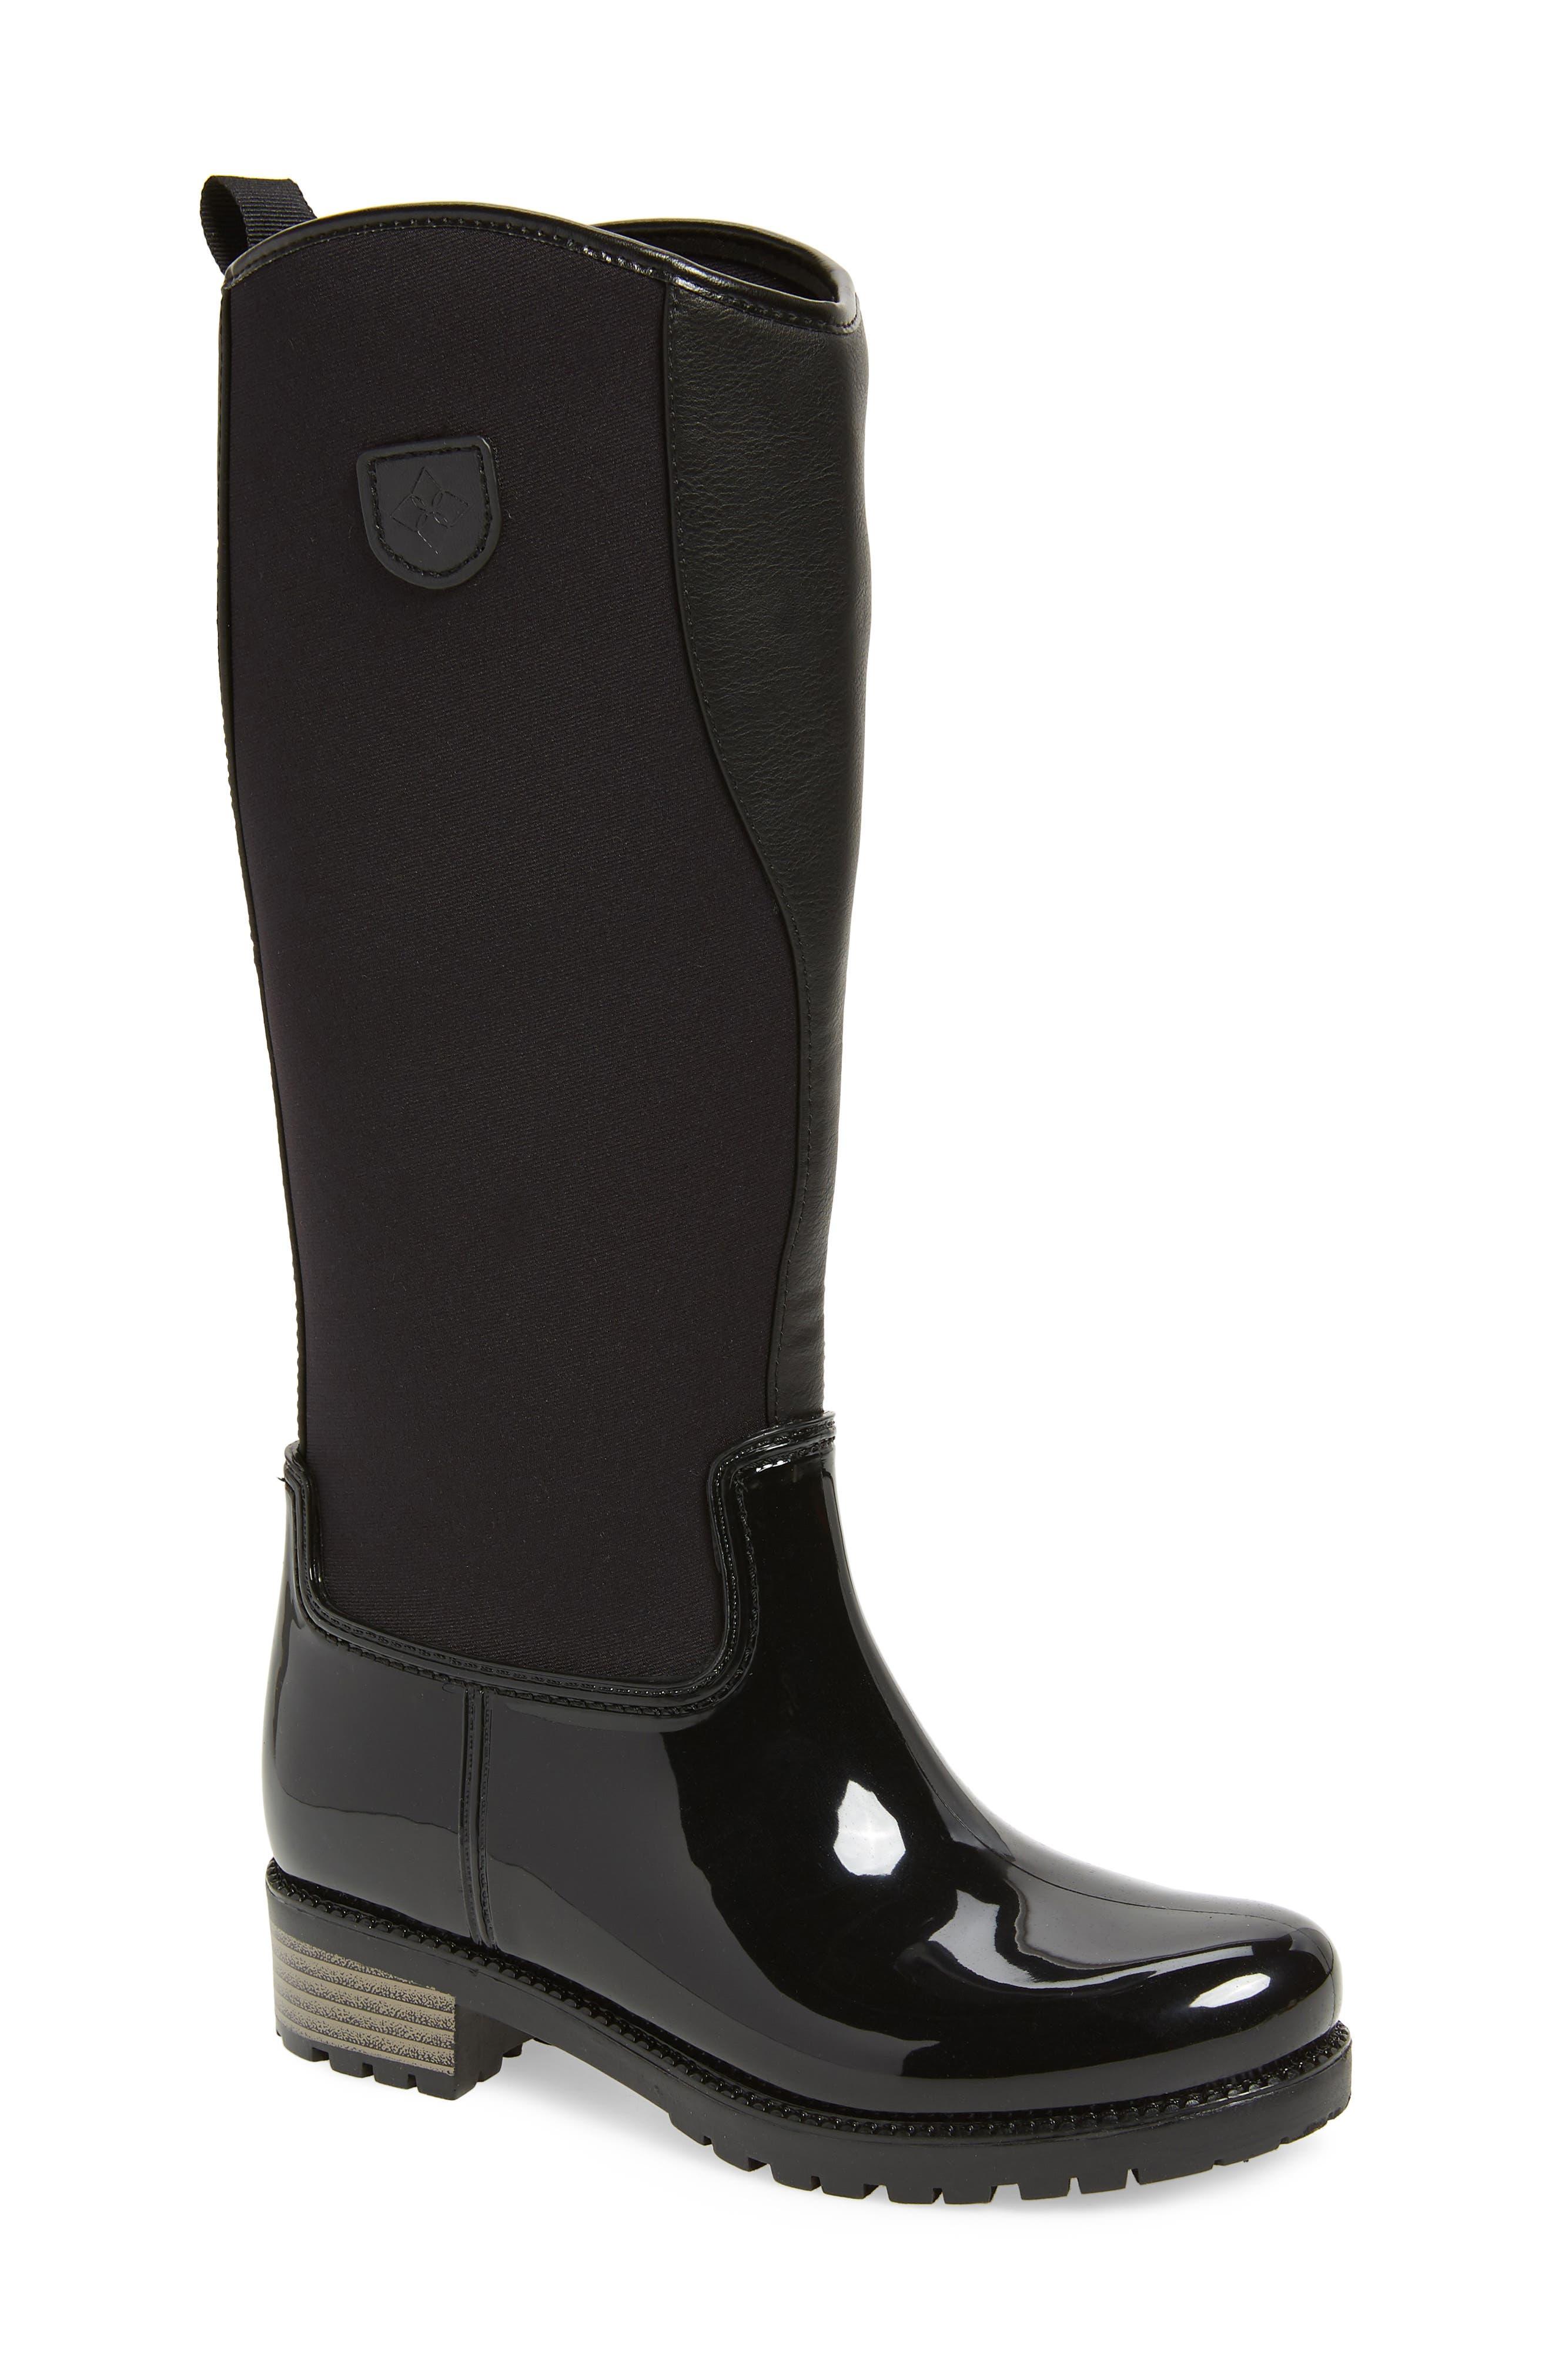 Dav Parma 2 Tall Waterproof Rain Boot, Black